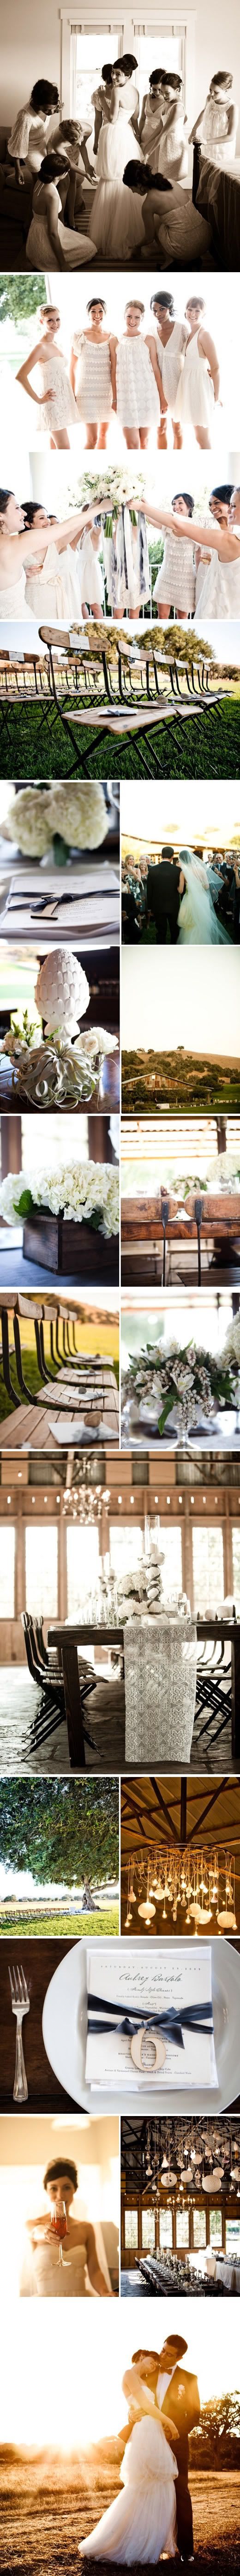 Traditionally Modern Designs: Los Olivos Wedding